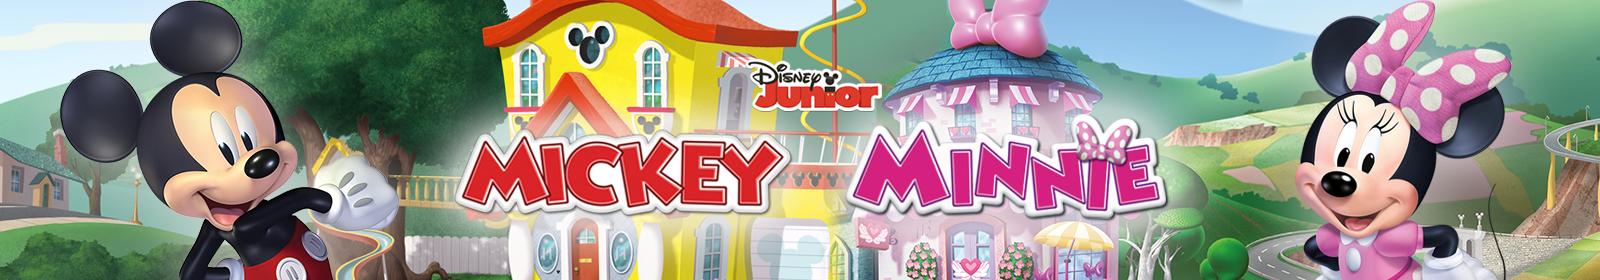 Brinquedos de Mickey e Minnie